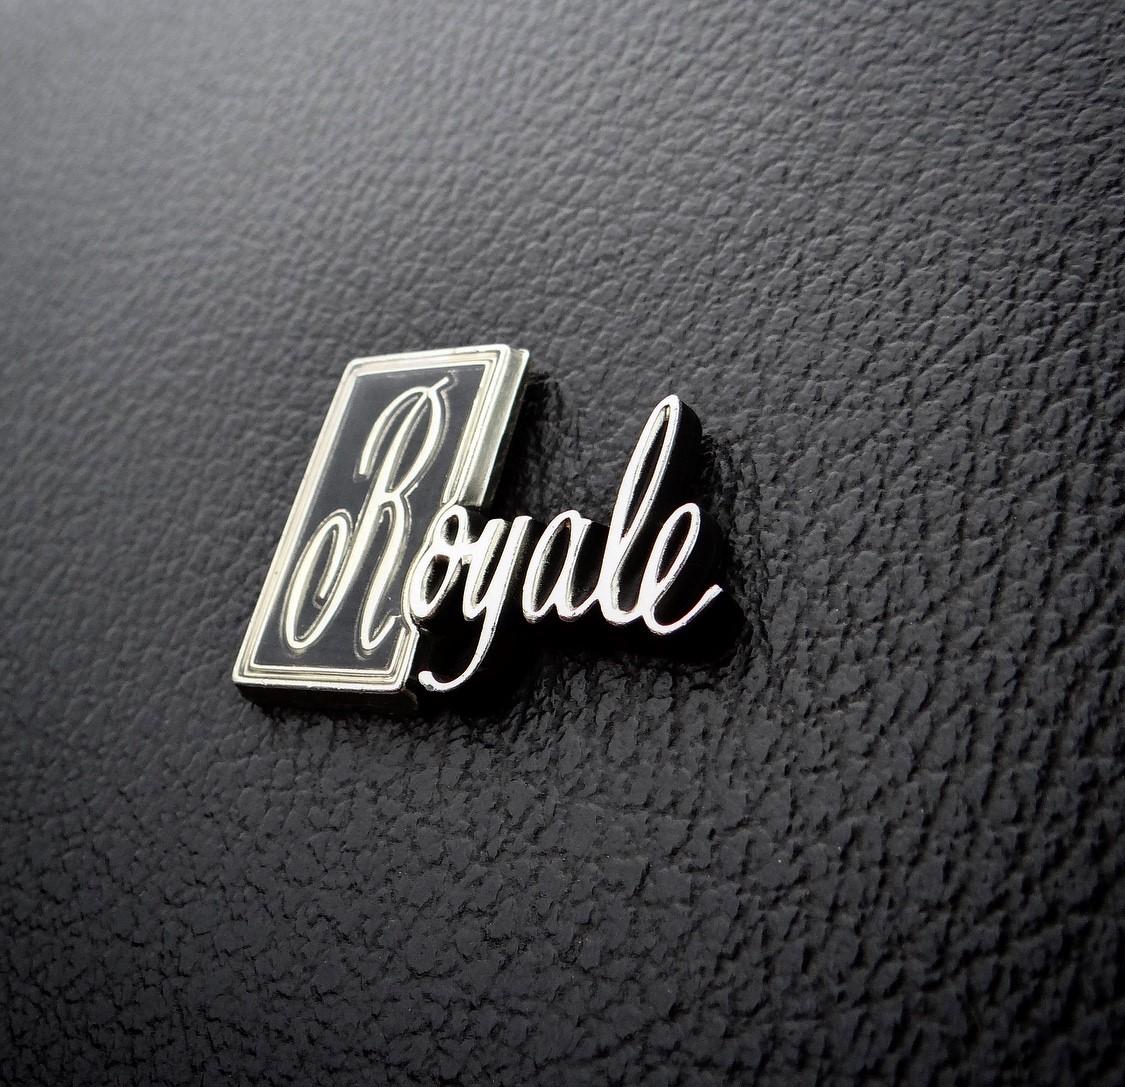 Delta 88 Royale badge